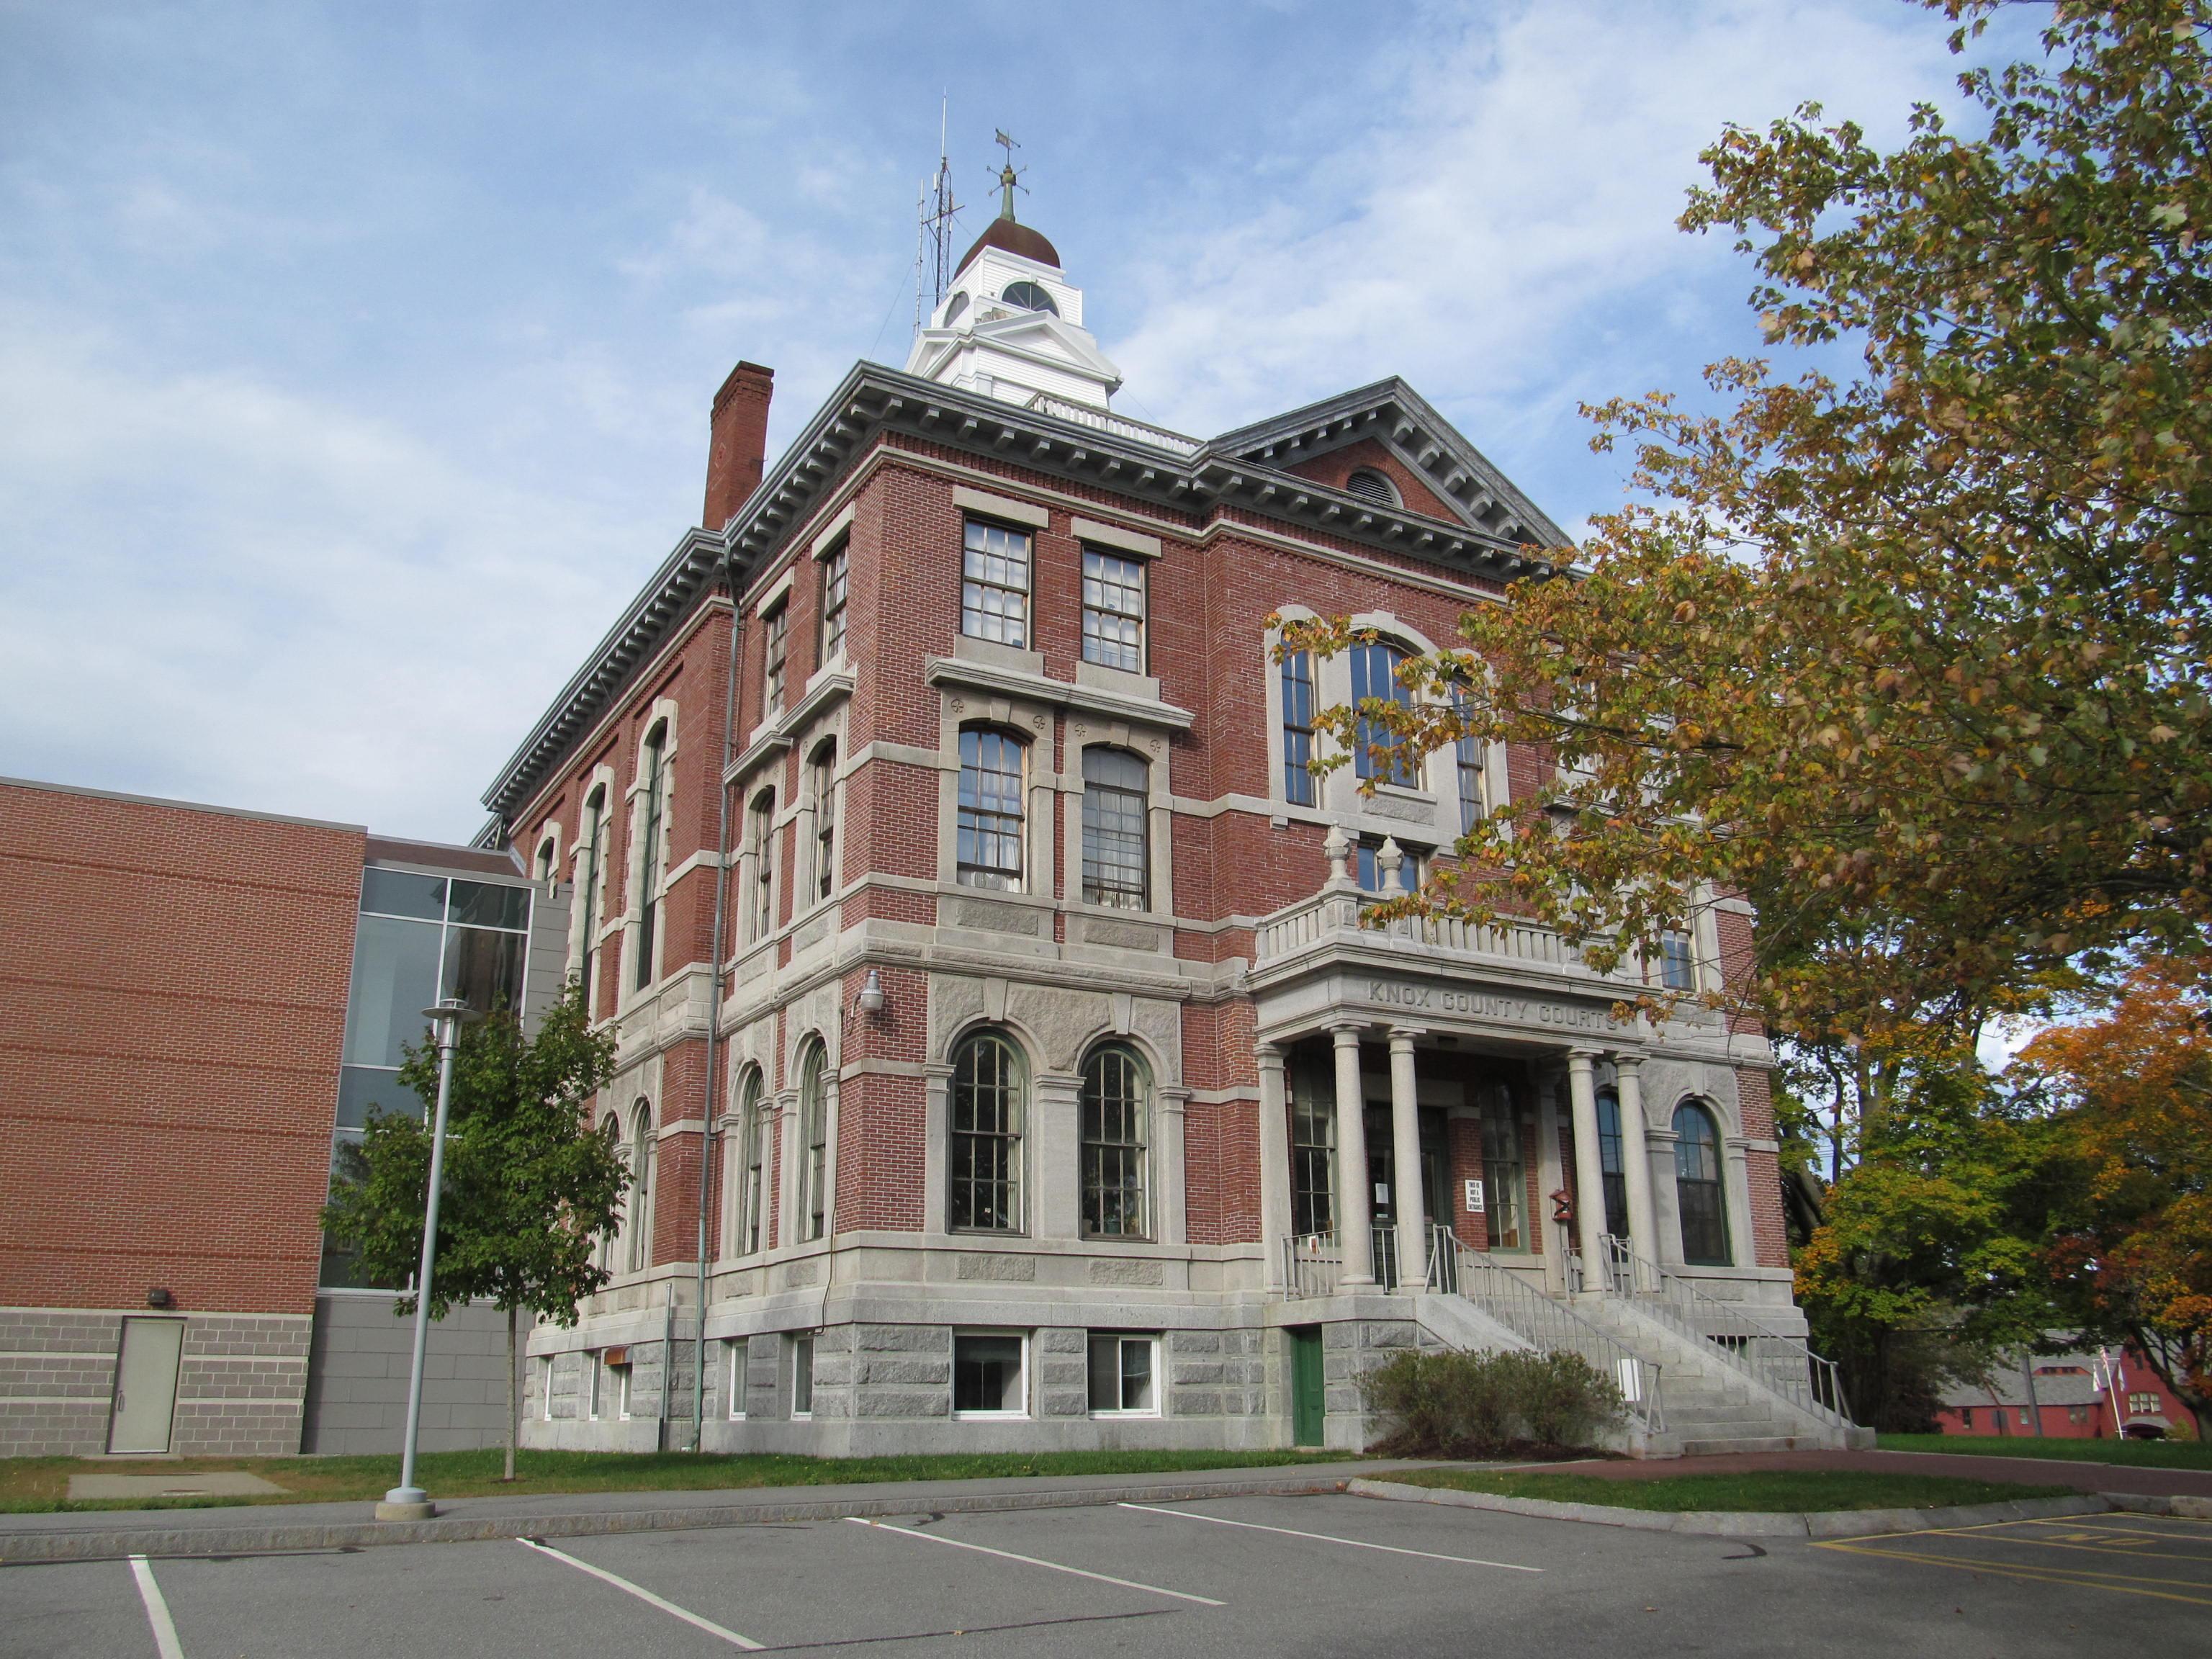 Knox County Building Permits List